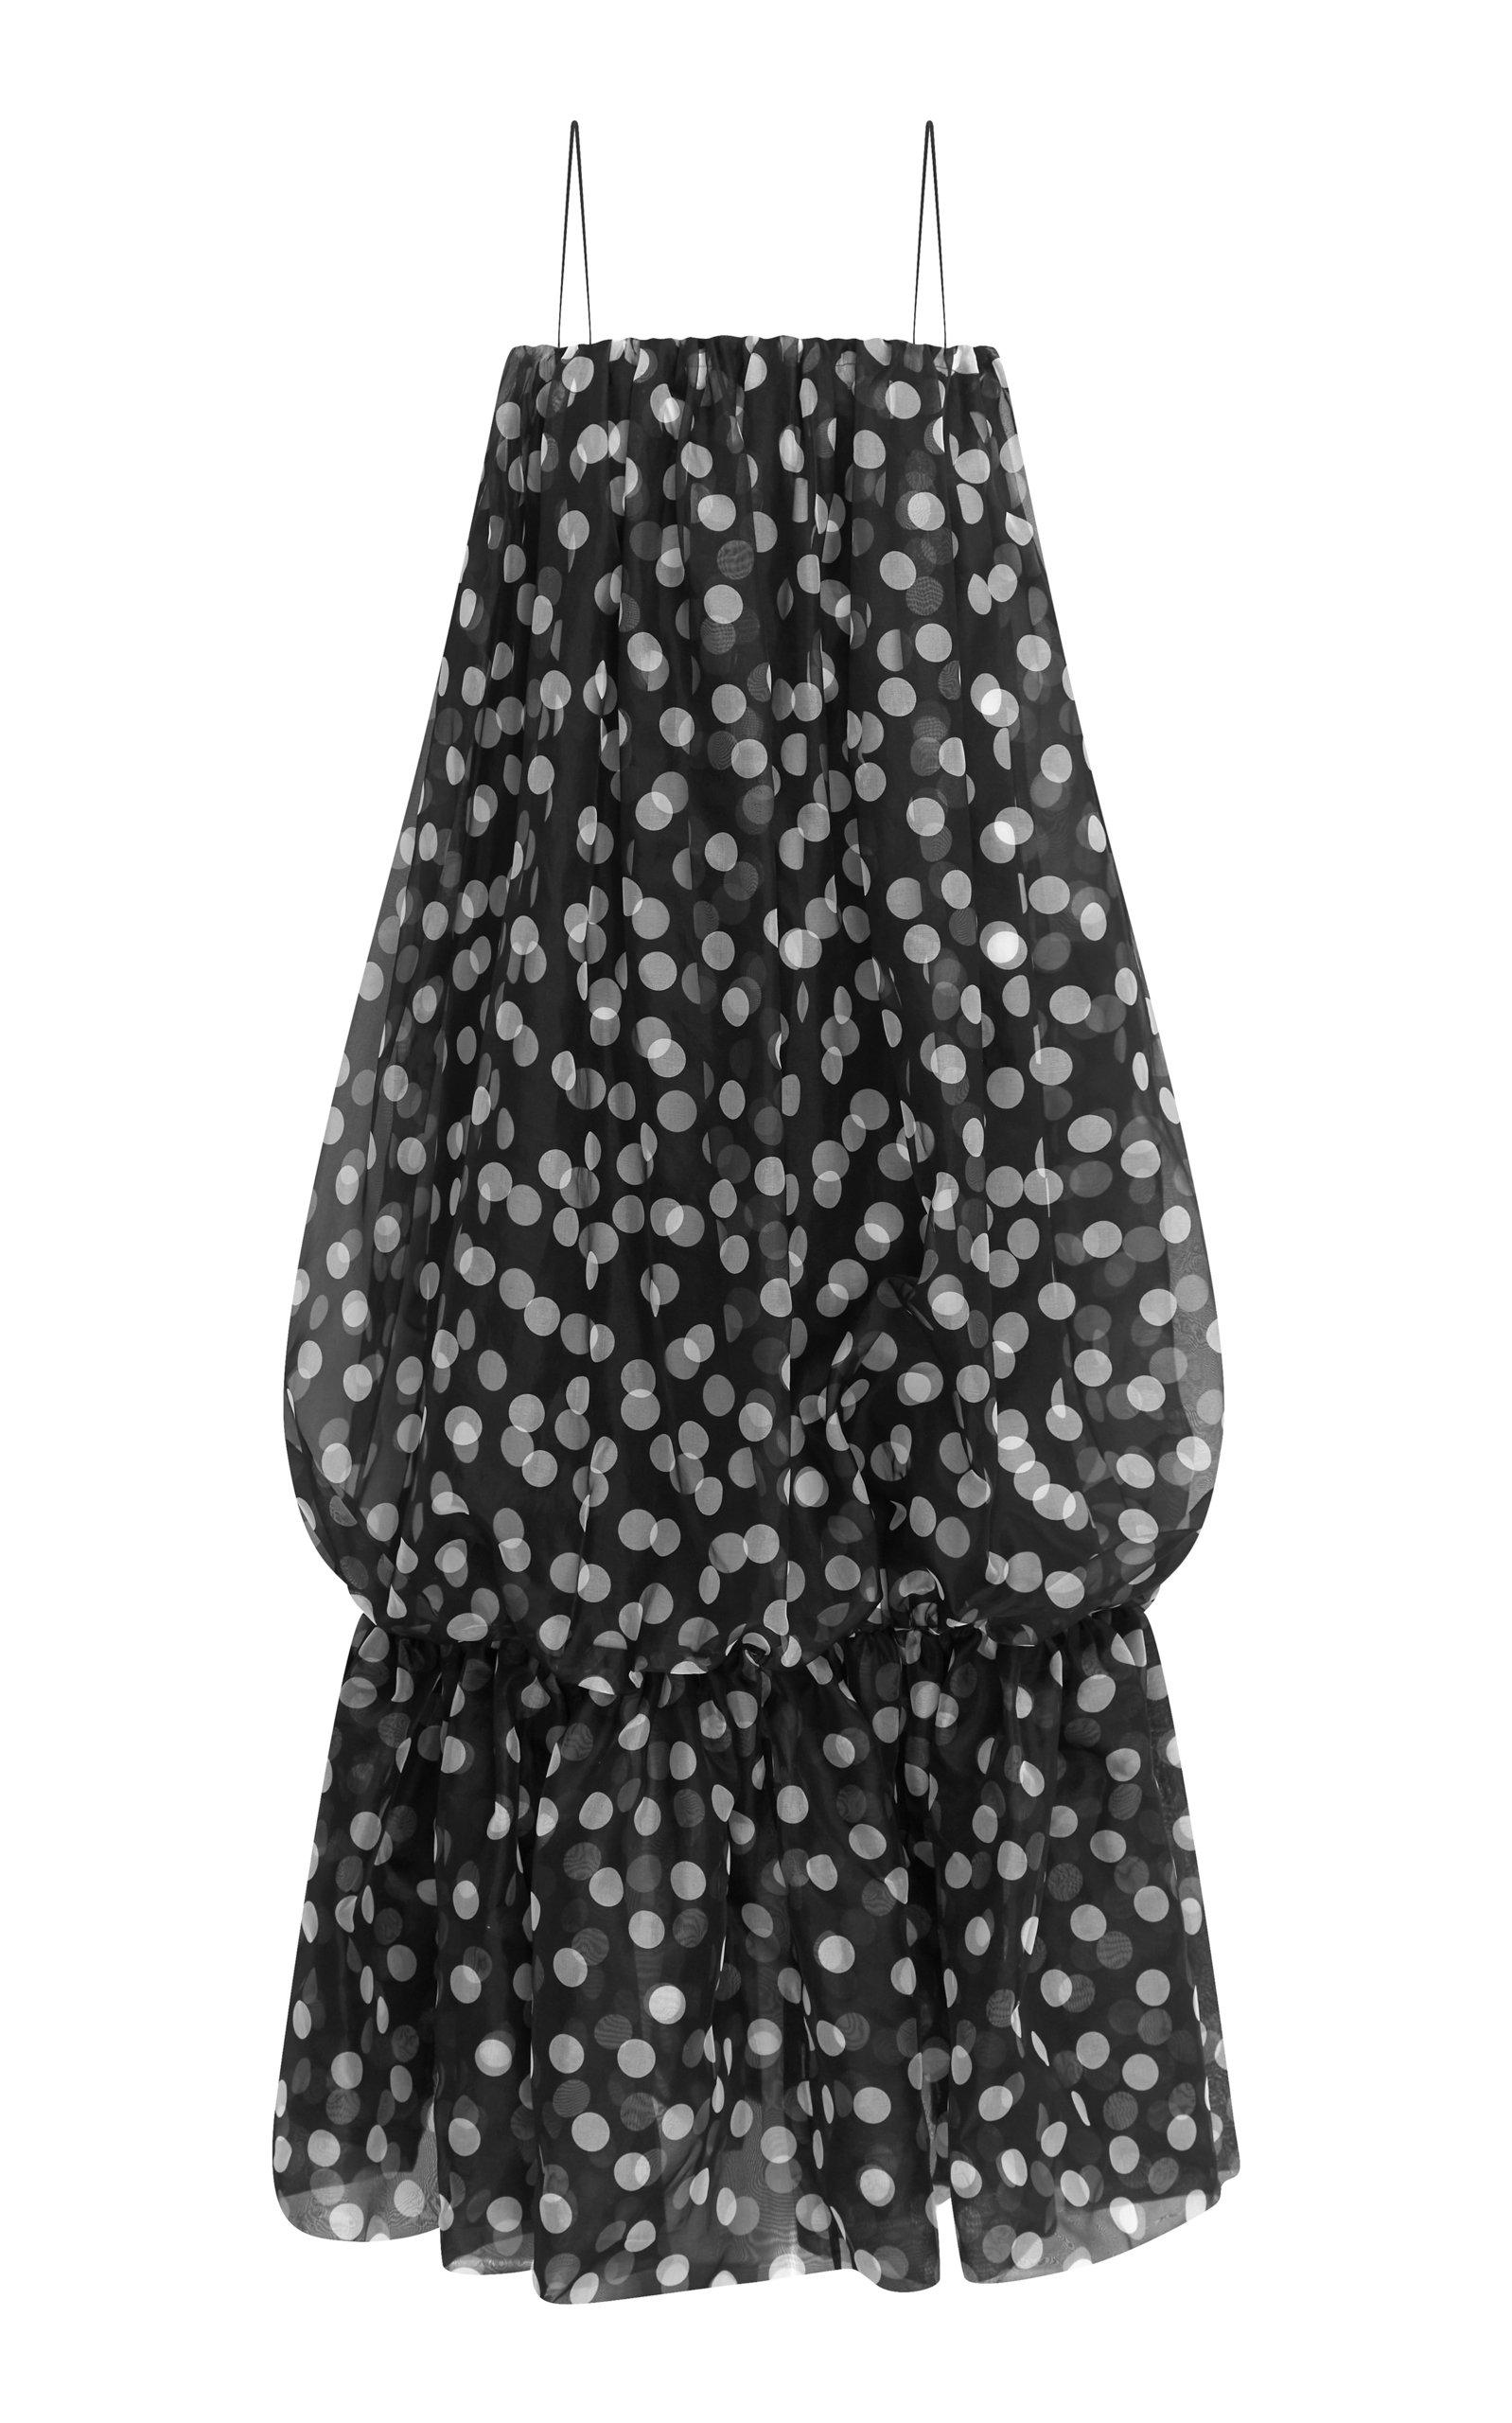 Buy LEE MATHEWS Cherry Spot Bubble Dress online, shop LEE MATHEWS at the best price